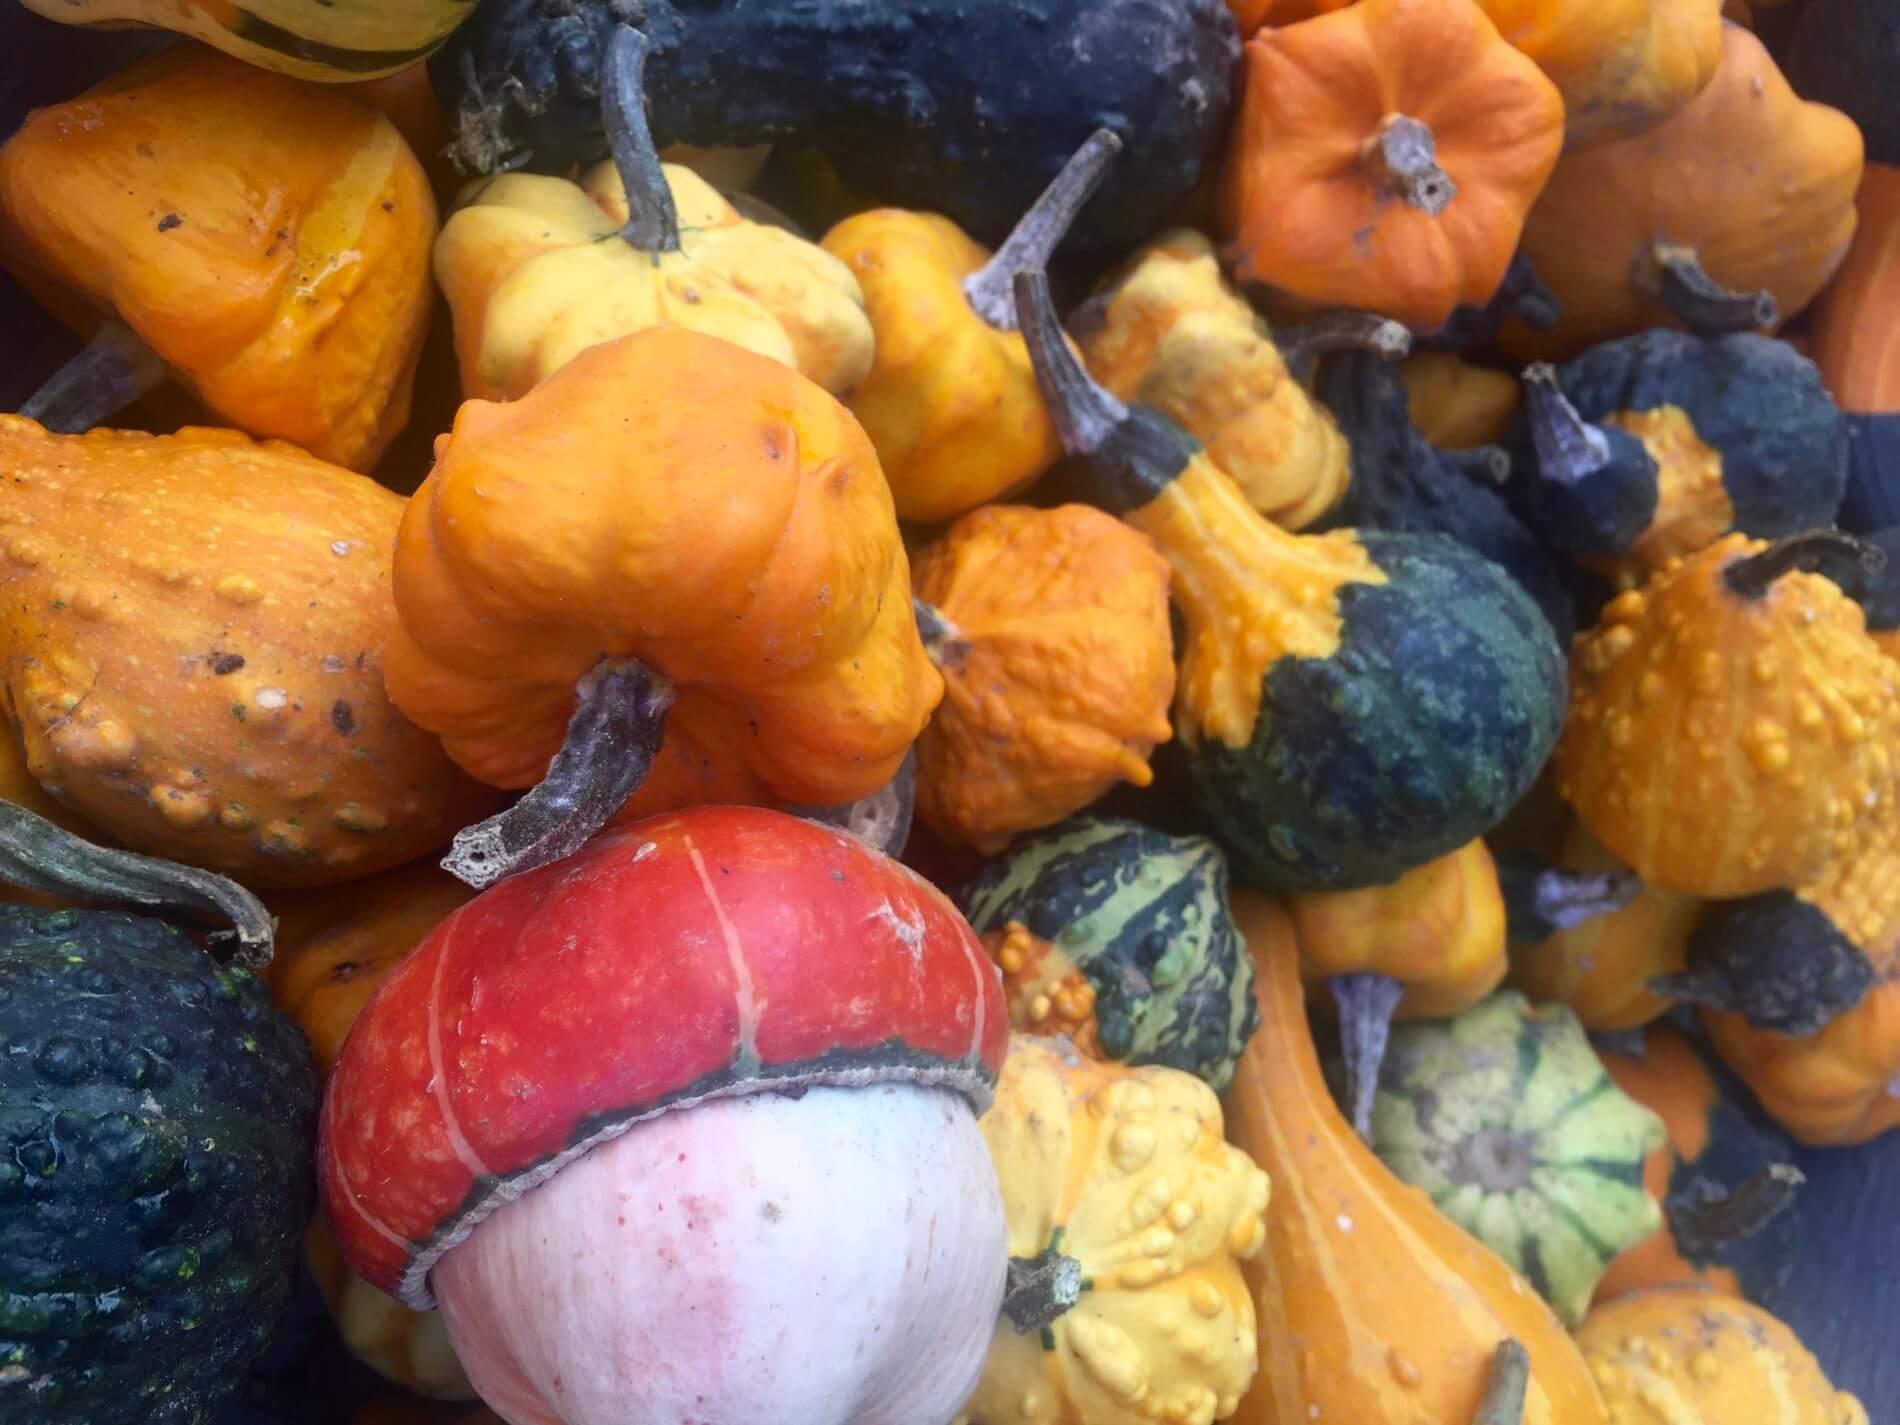 Herbstwanderung Holnis_Kürbisse am Hofladen